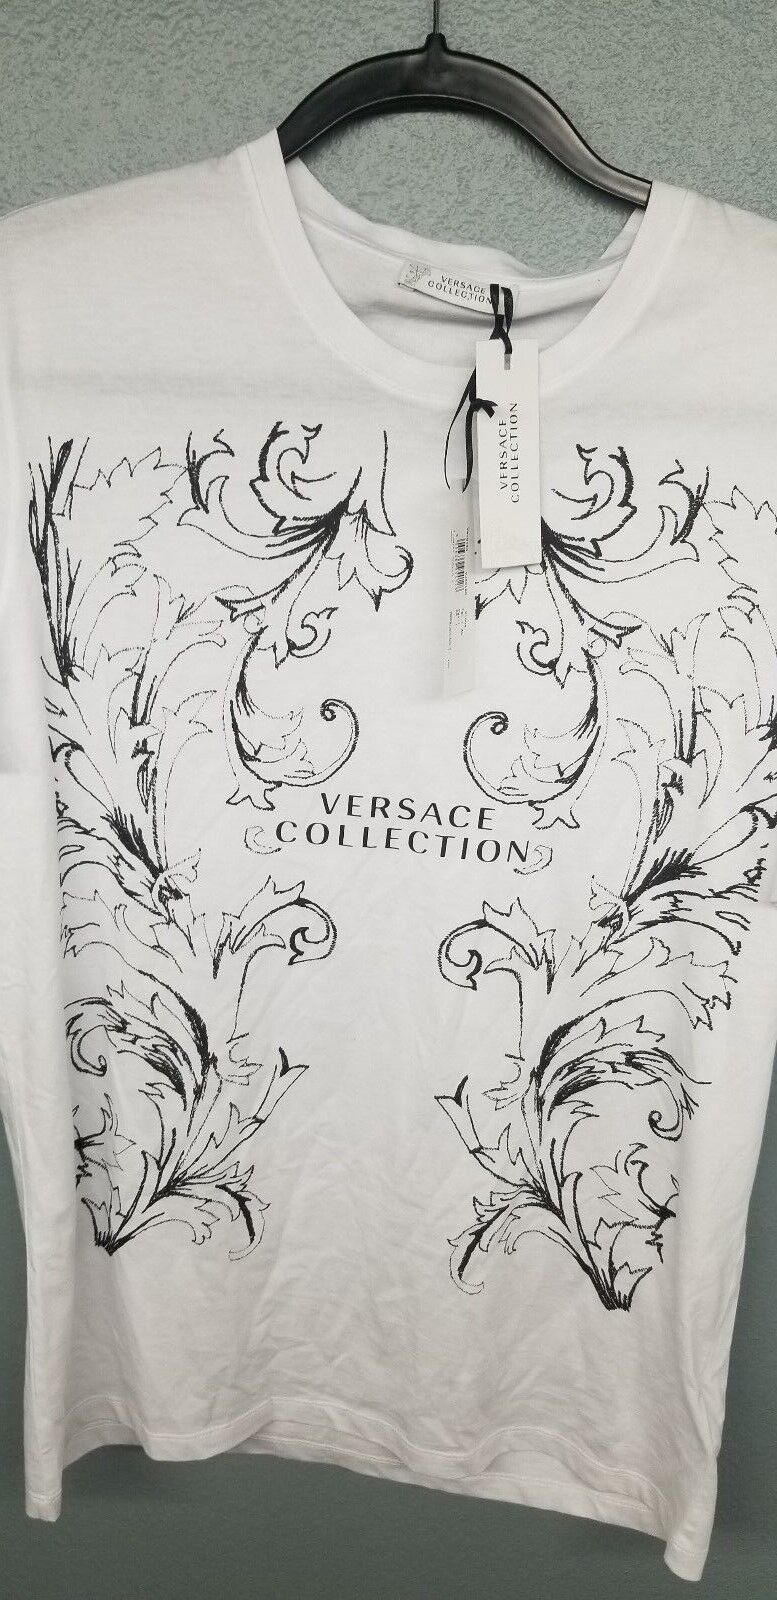 Versace collection white logo shirt